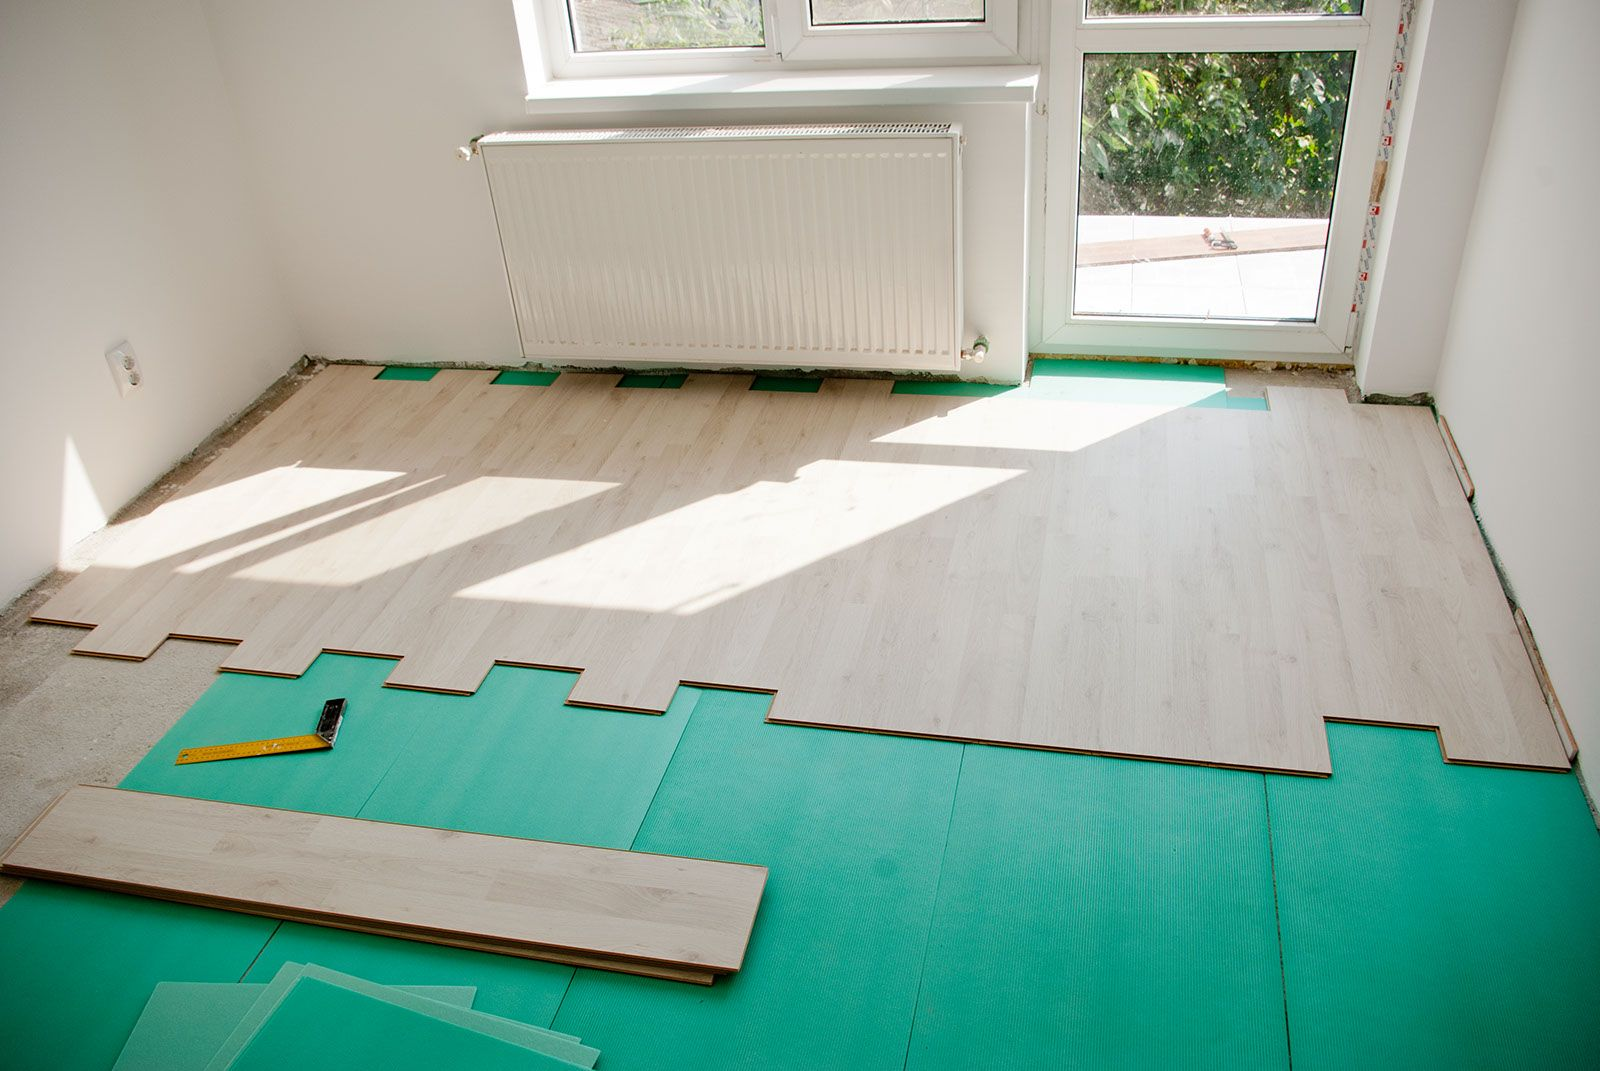 How to install laminate flooring Laminate flooring